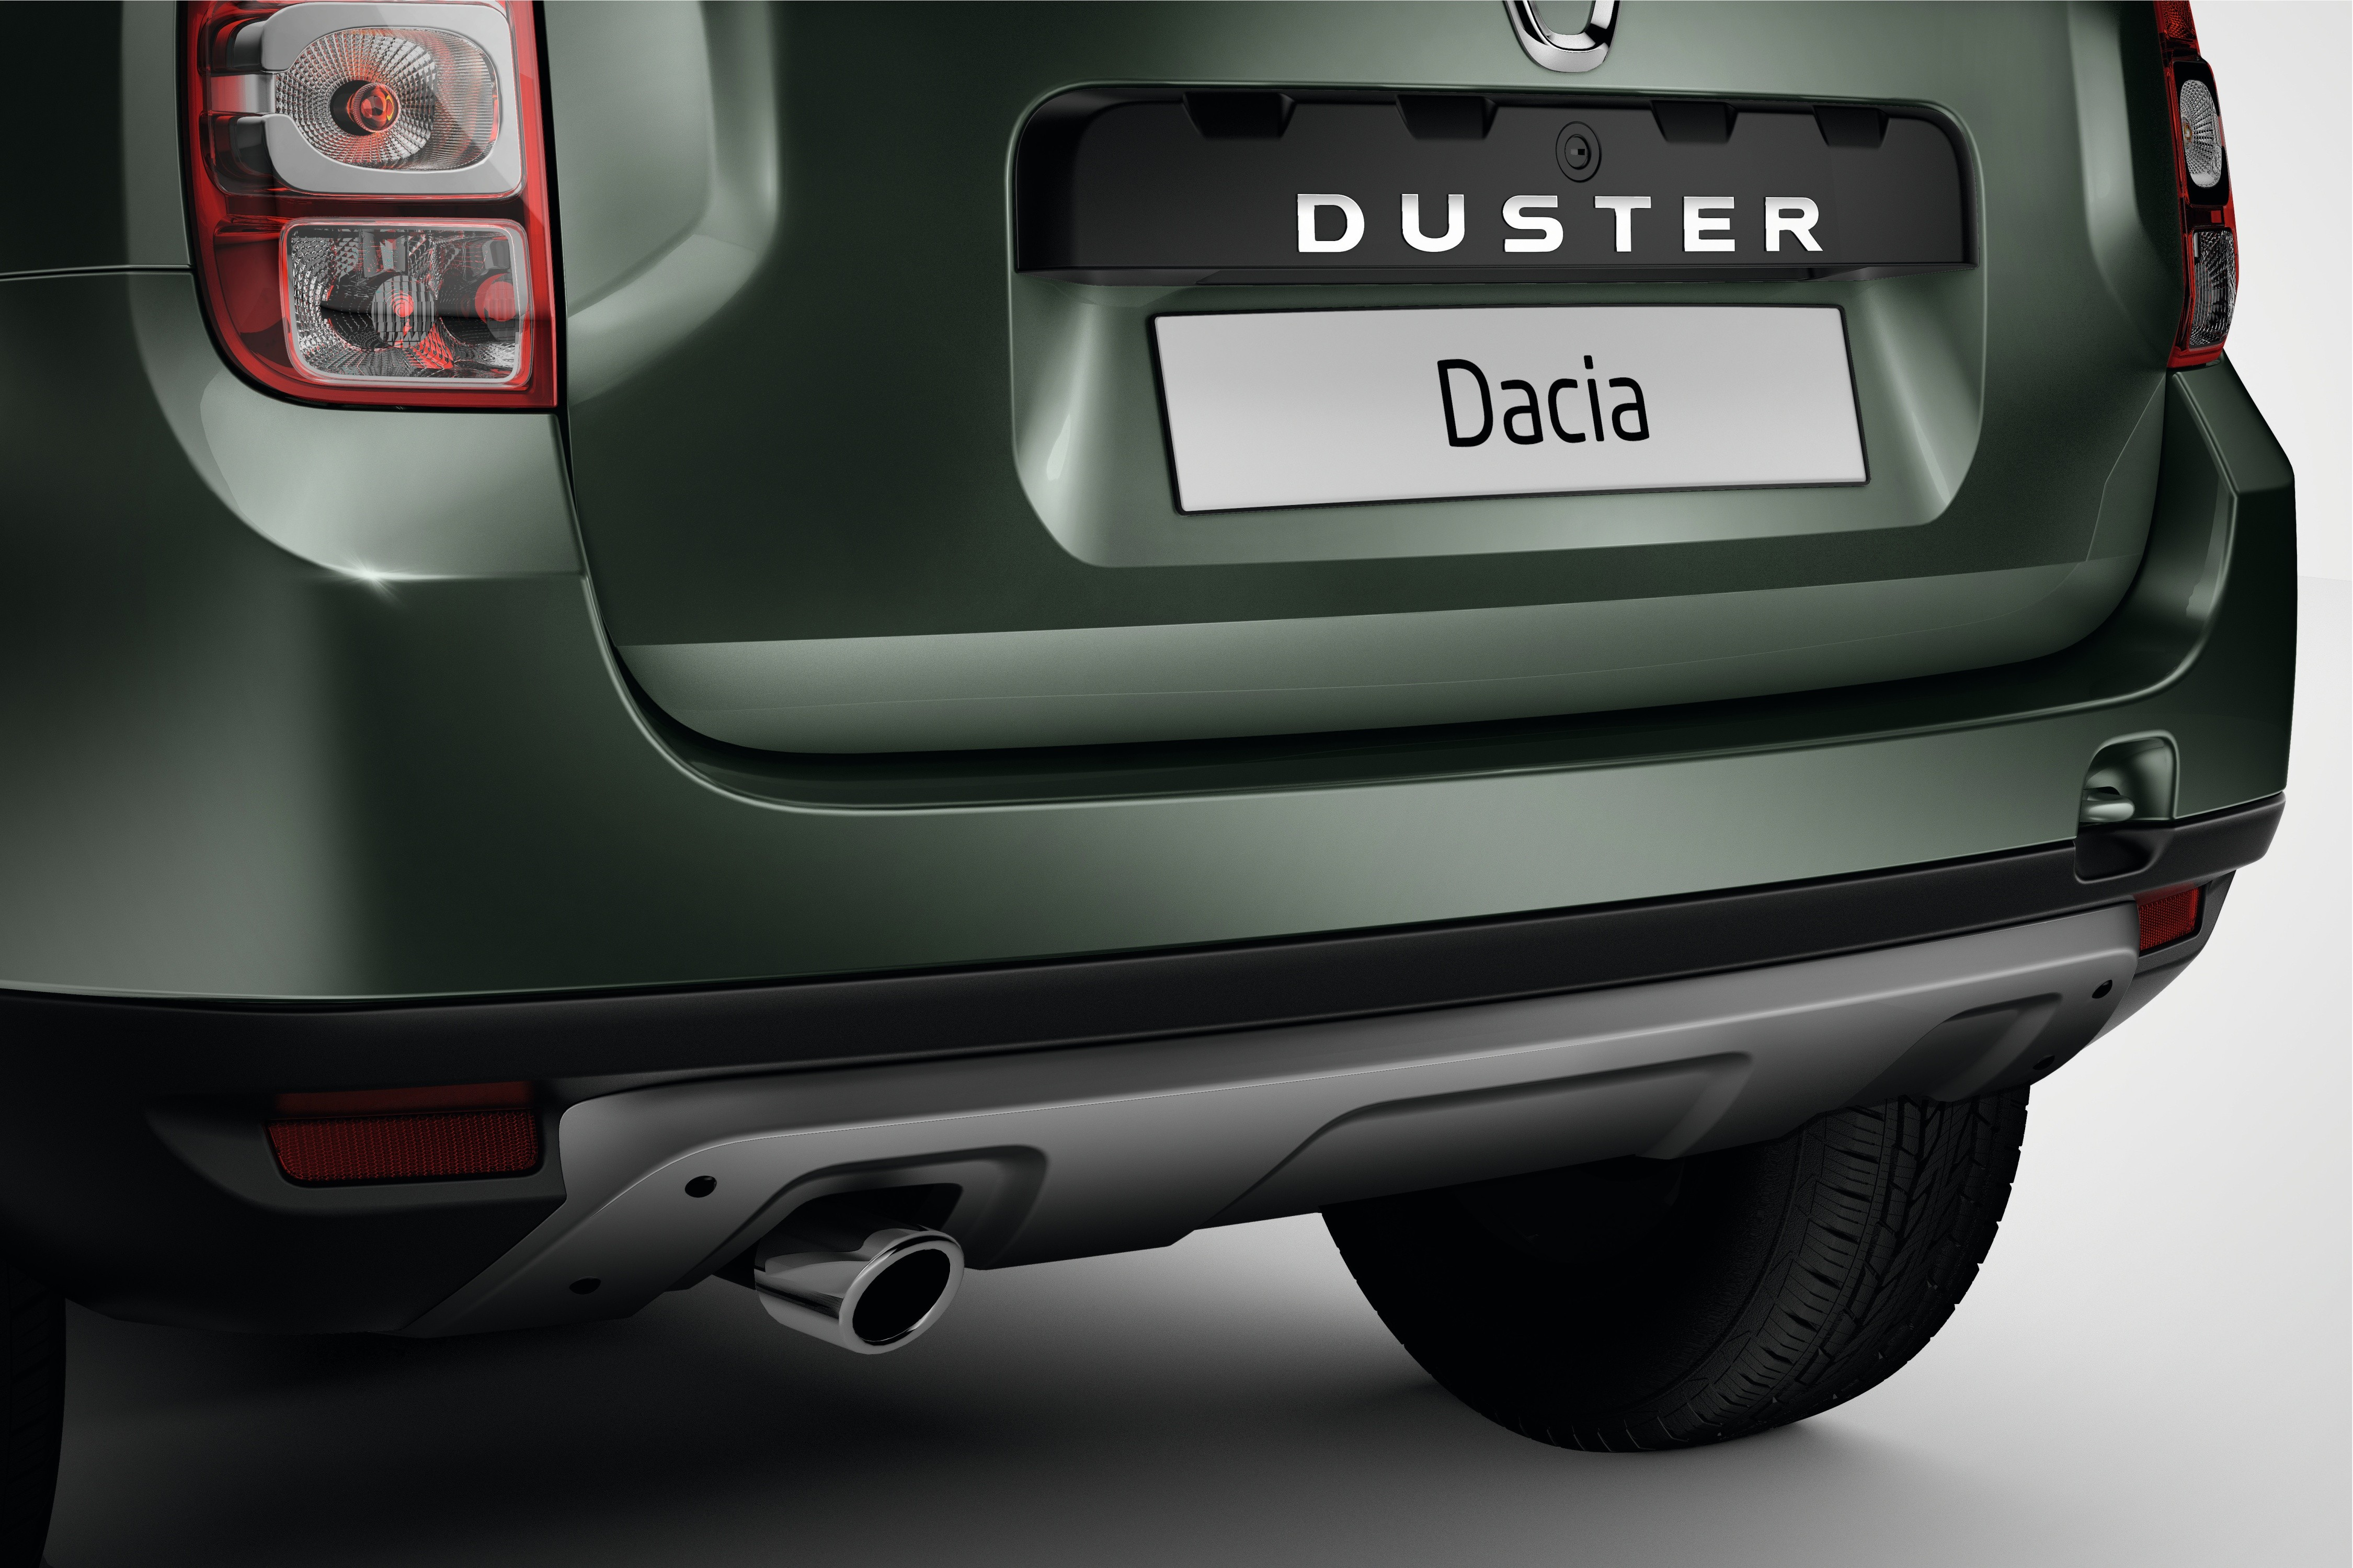 Dacia Top Sponsor Serie B Eurobet 2013/2014